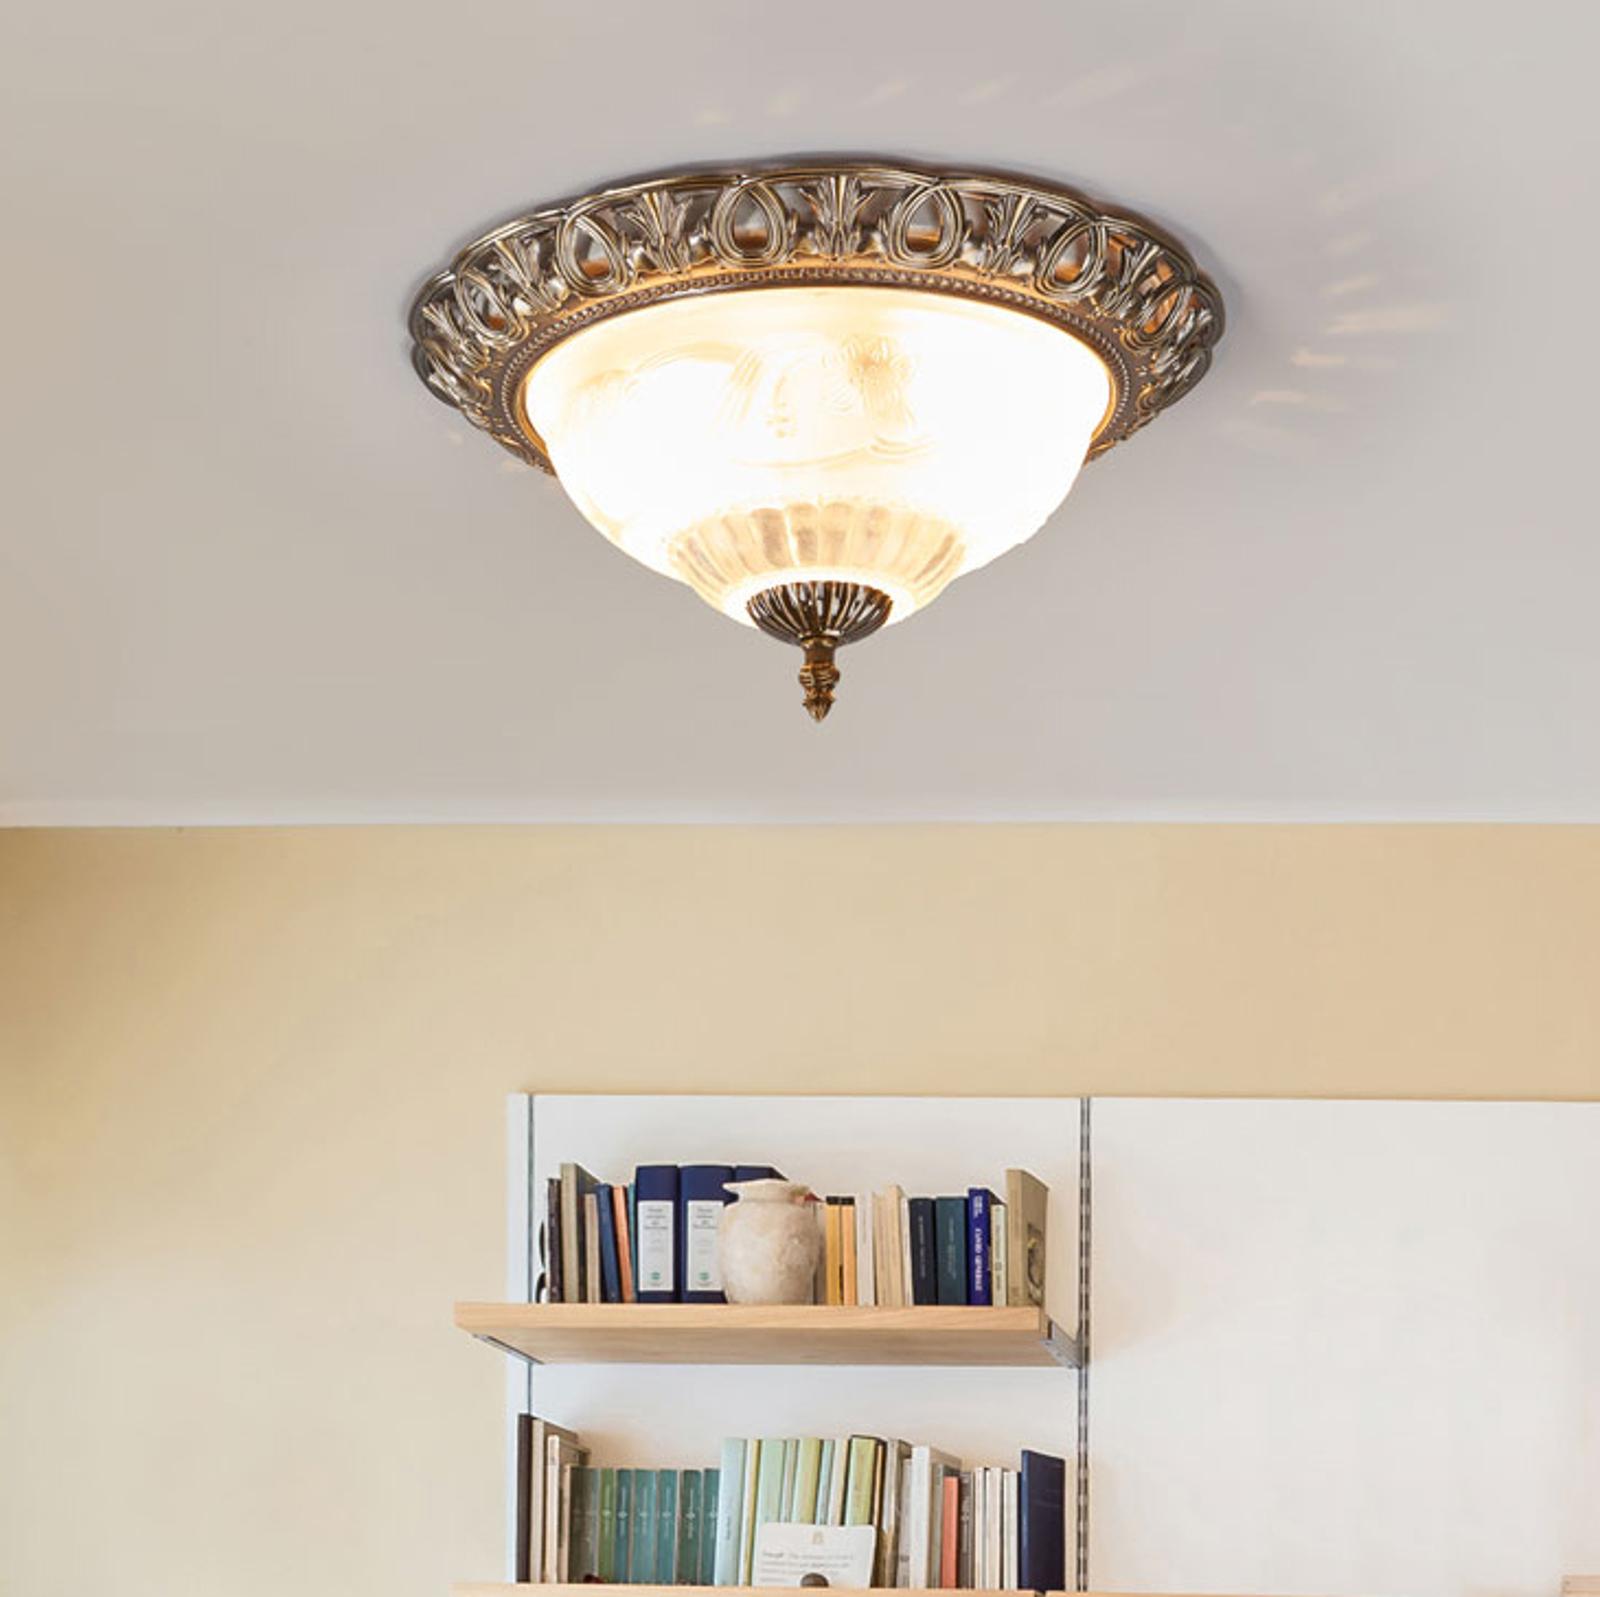 Stijlvolle plafondlamp TERESA met sierrand